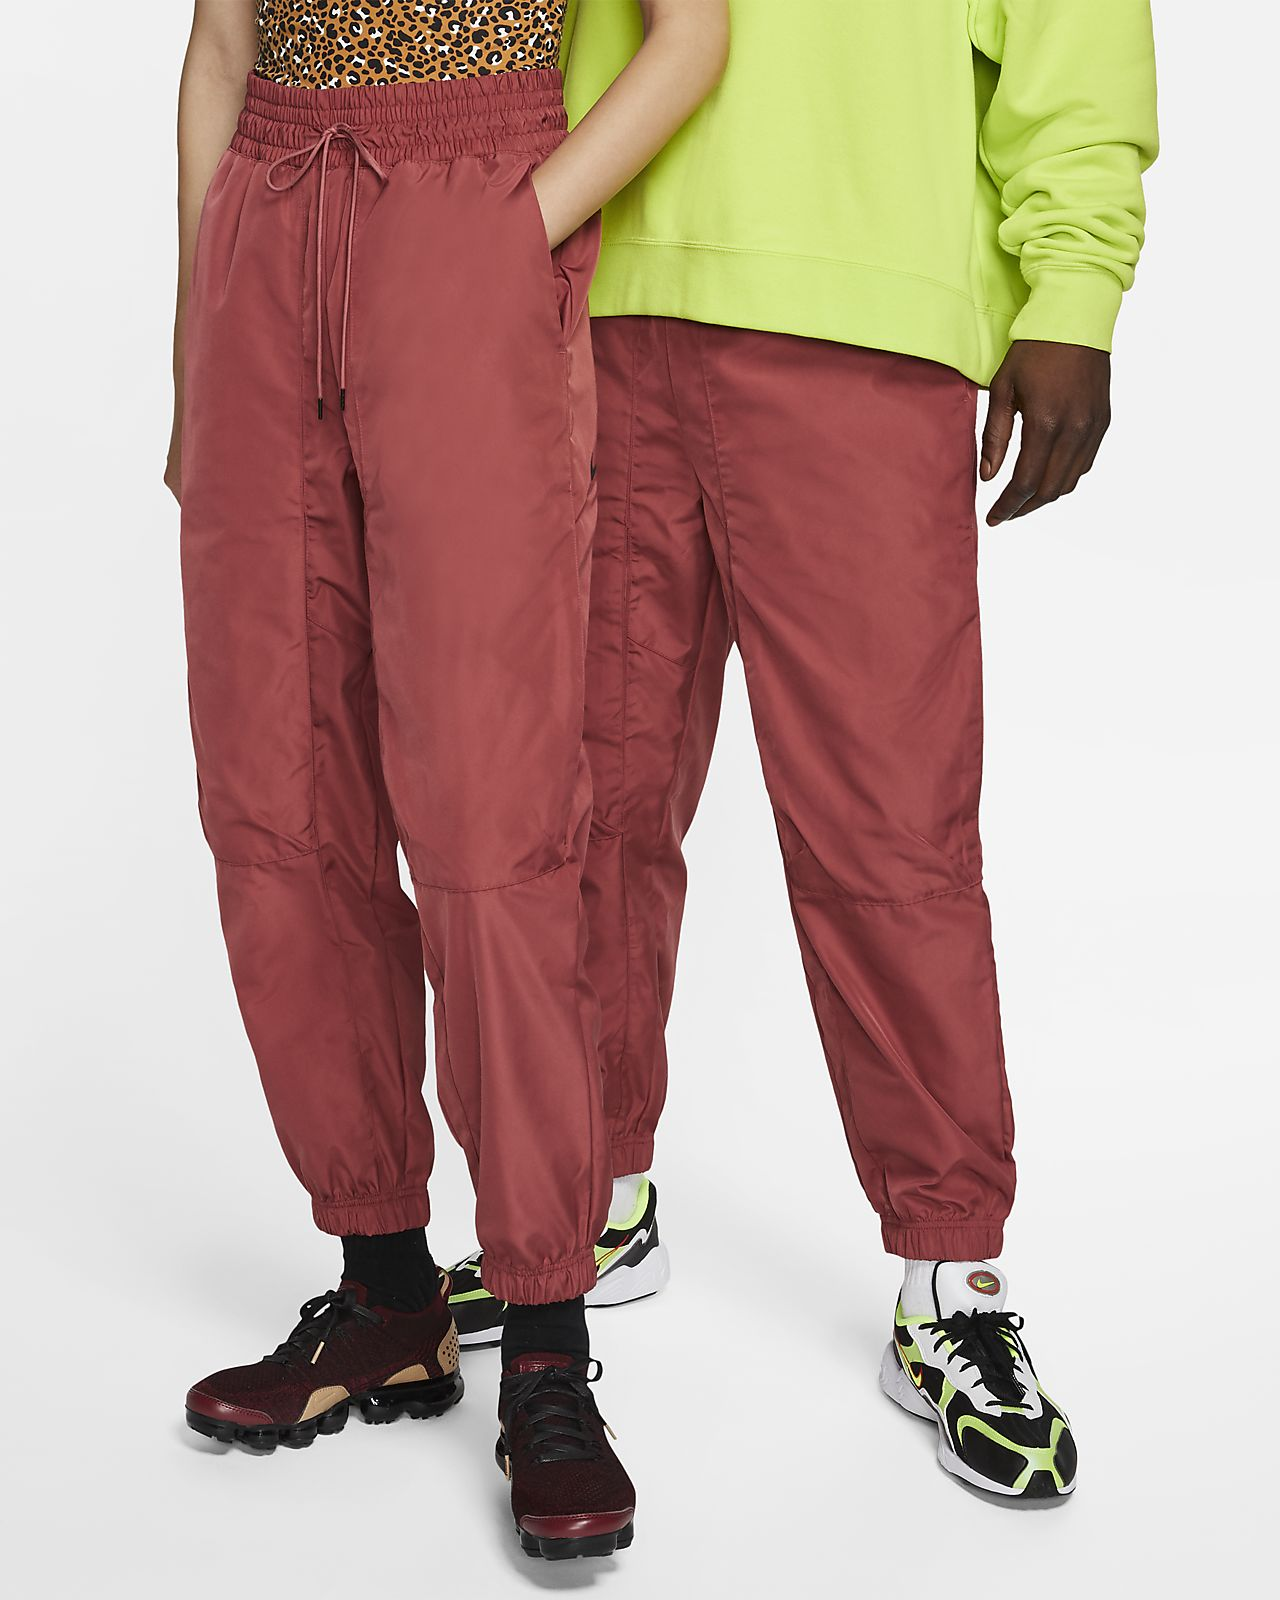 Pantalones tejidos Nike Sportswear City Ready